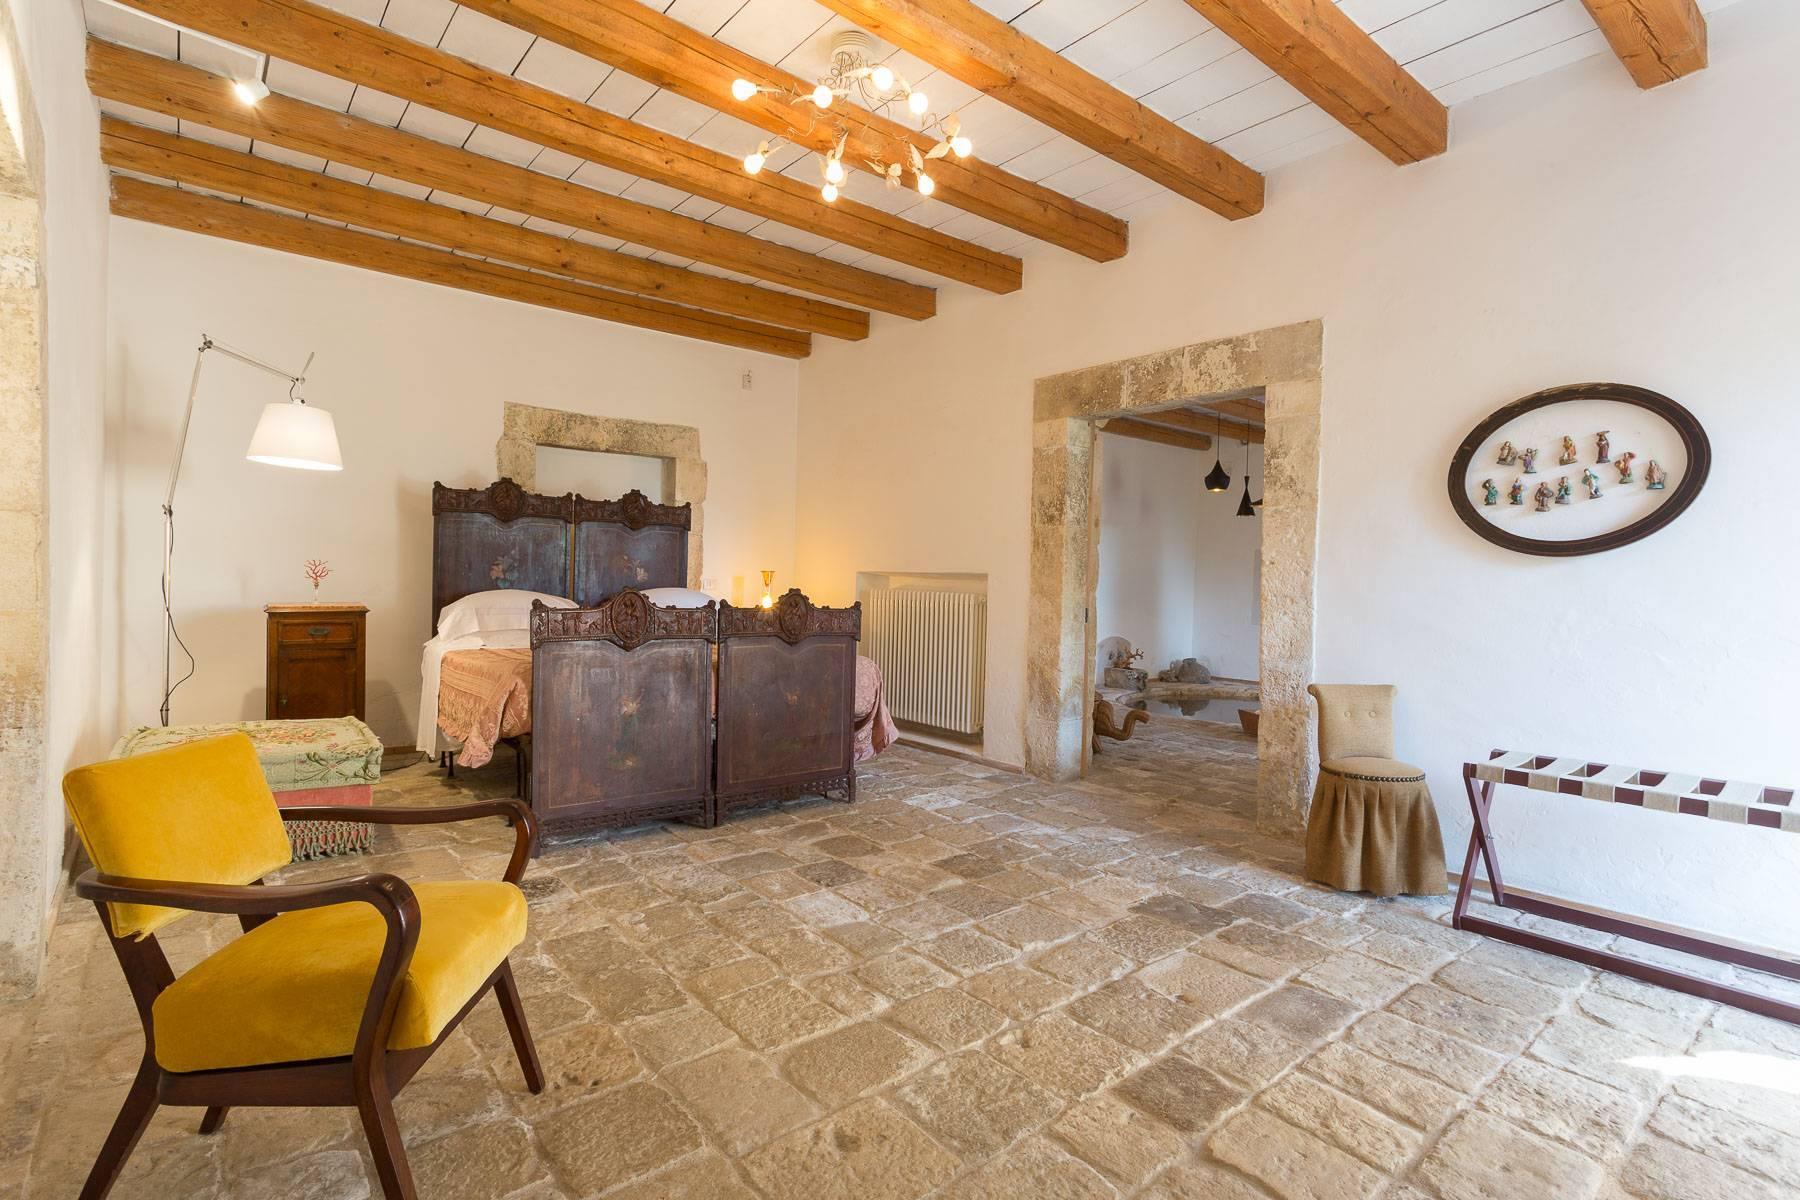 Authentic farmhouse with Sicilian flavor - 16